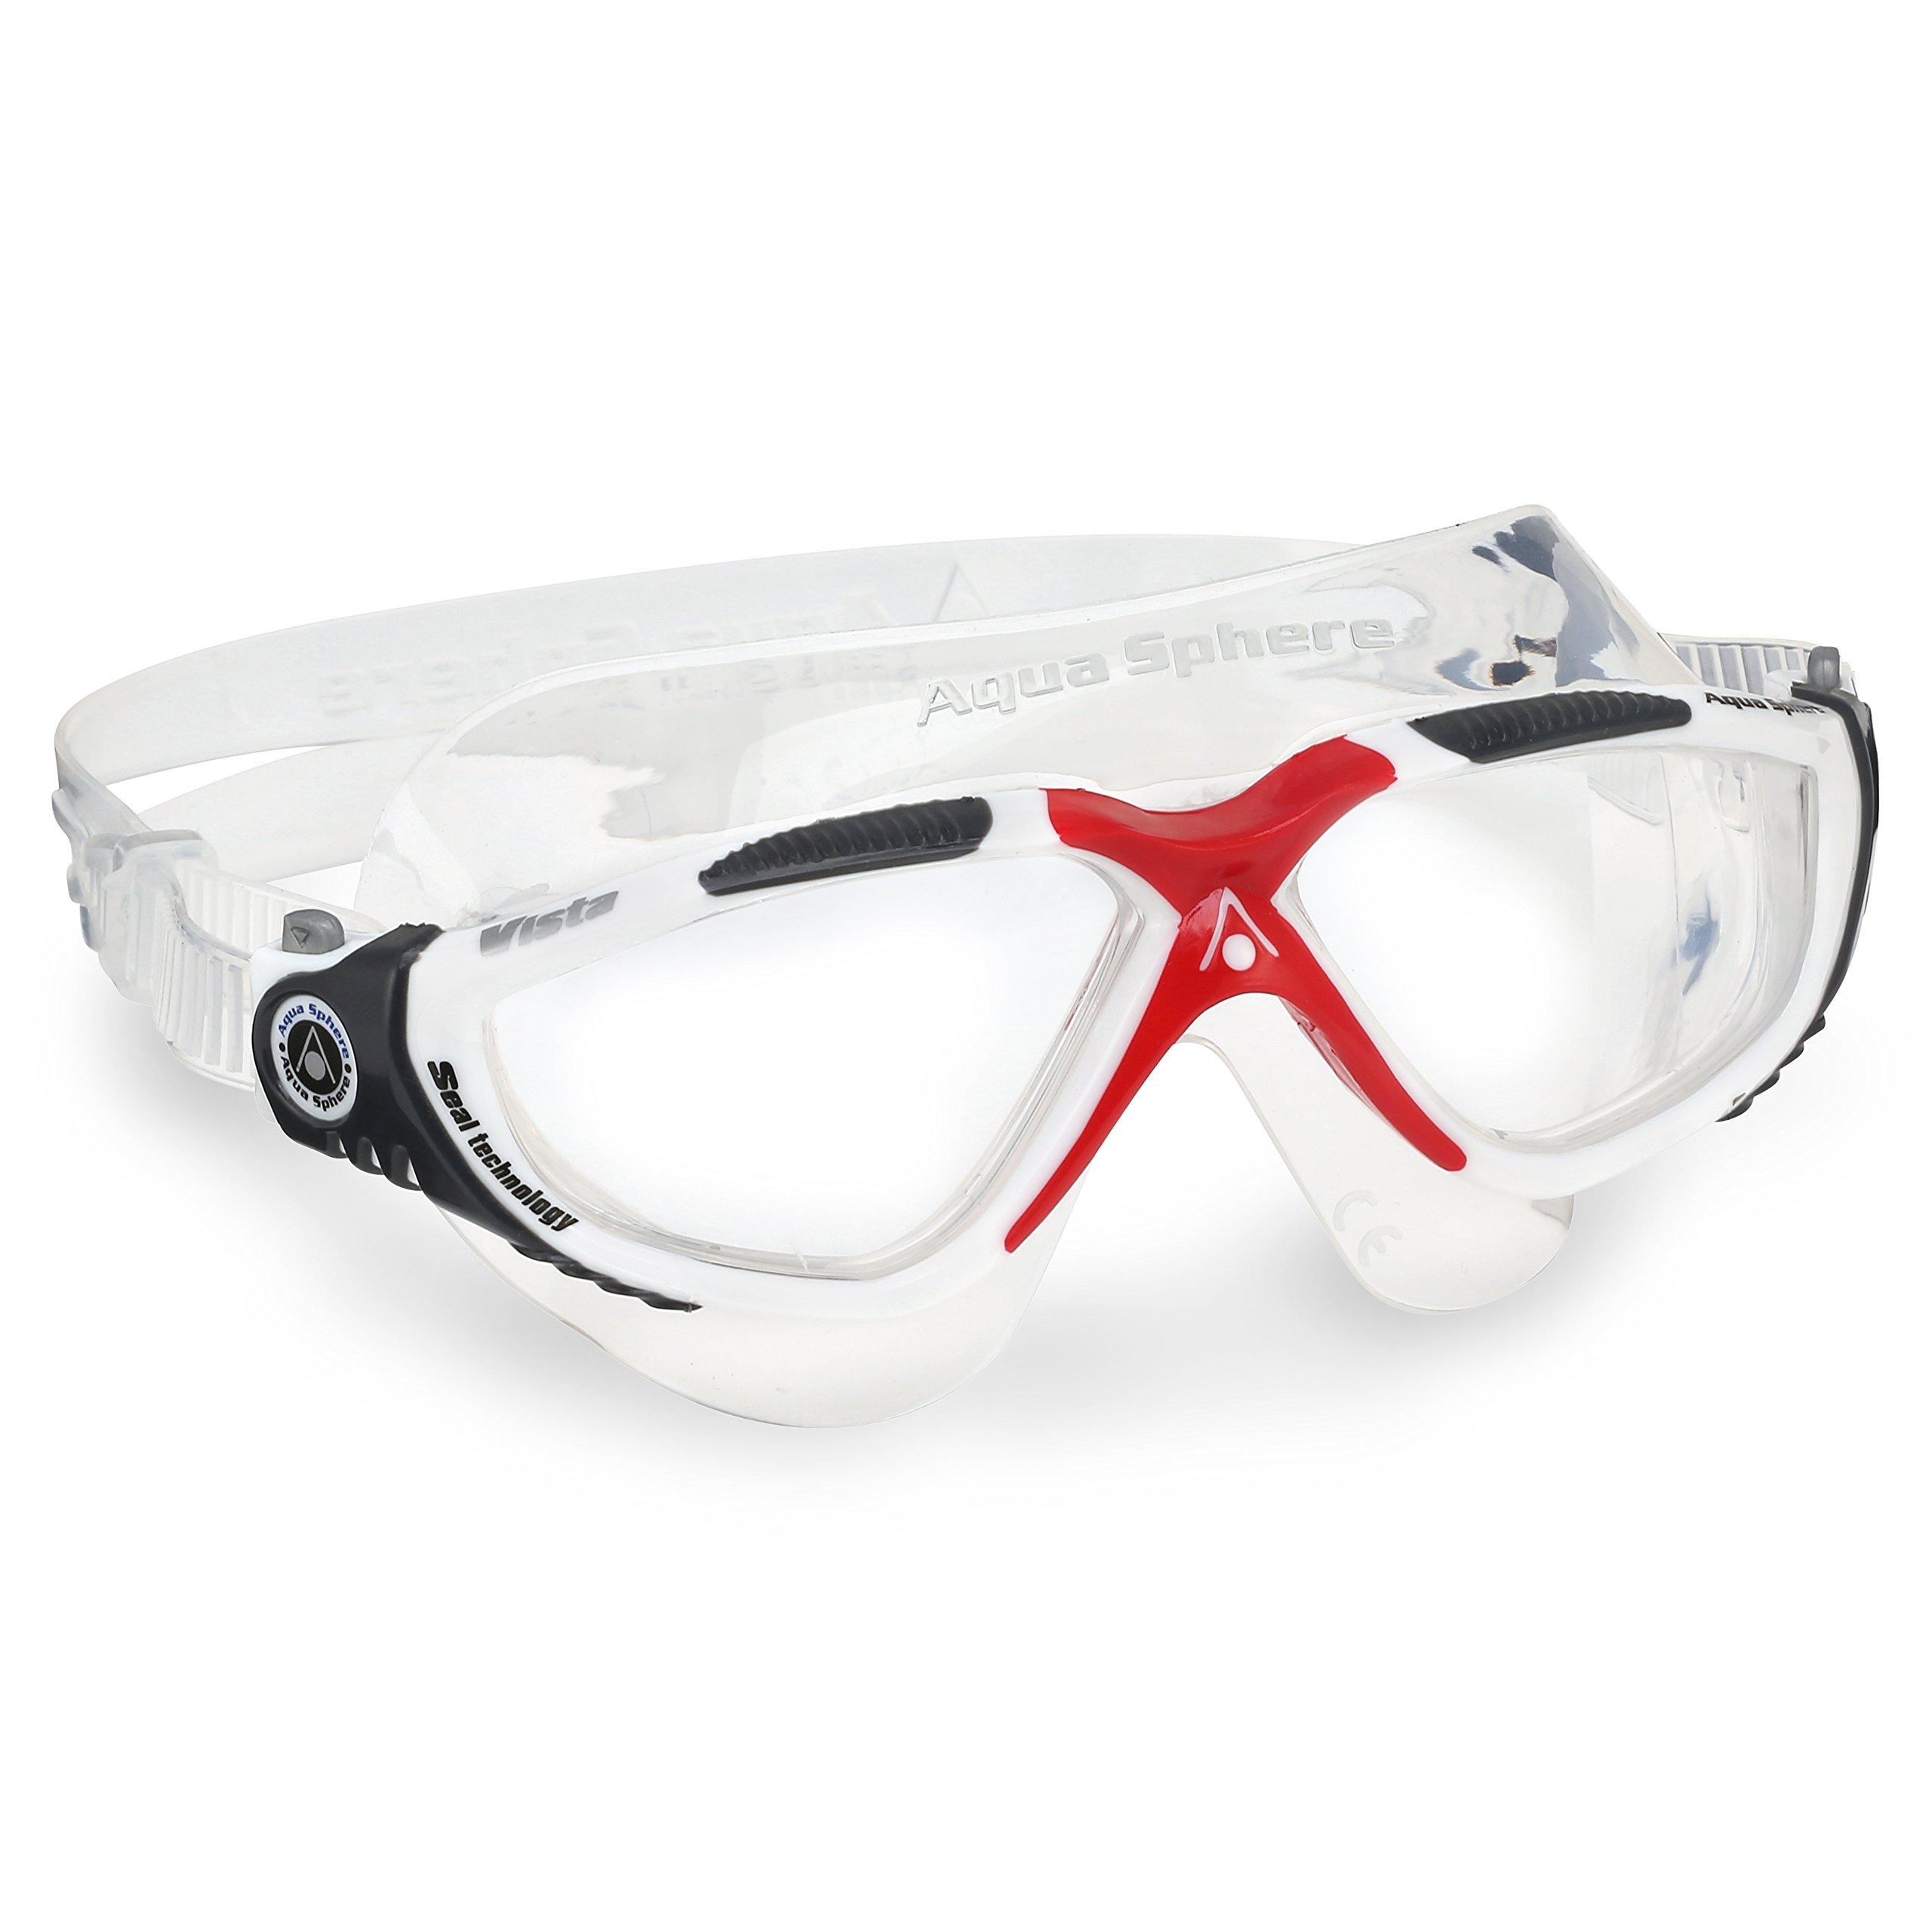 Aqua Sphere Vista Swim Mask Goggles, Clear Lens, White/Red